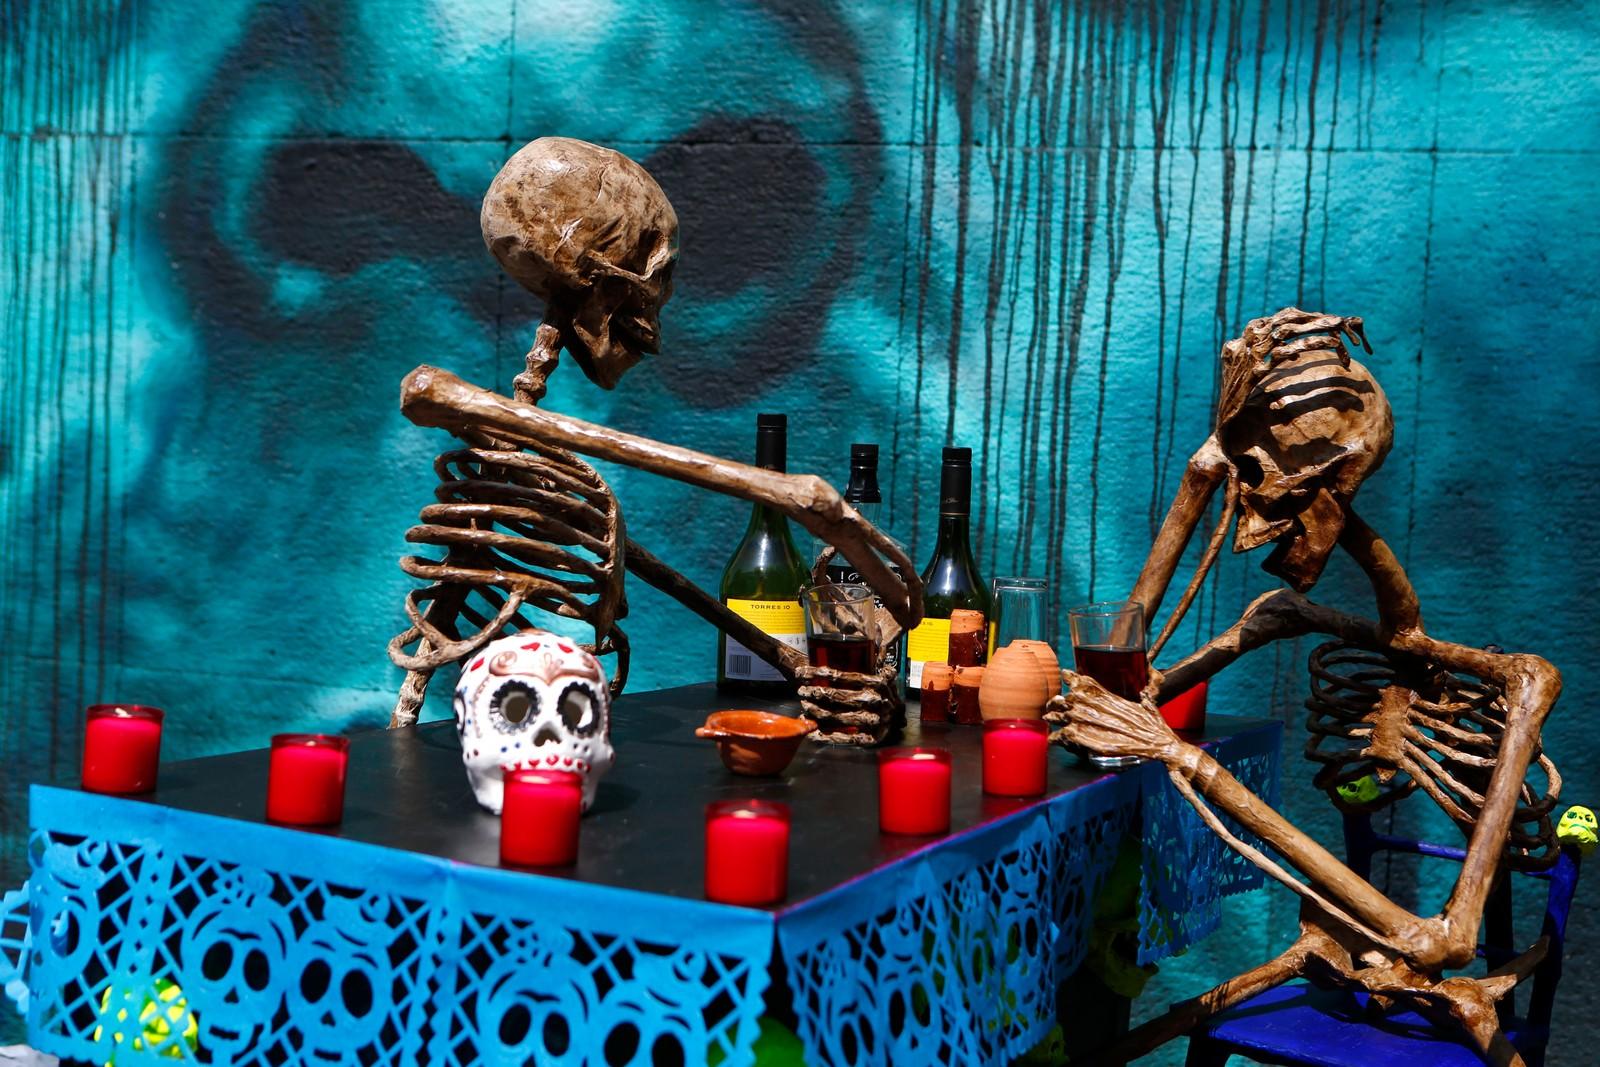 I Mexico har de feiret De dødes dag lenge.